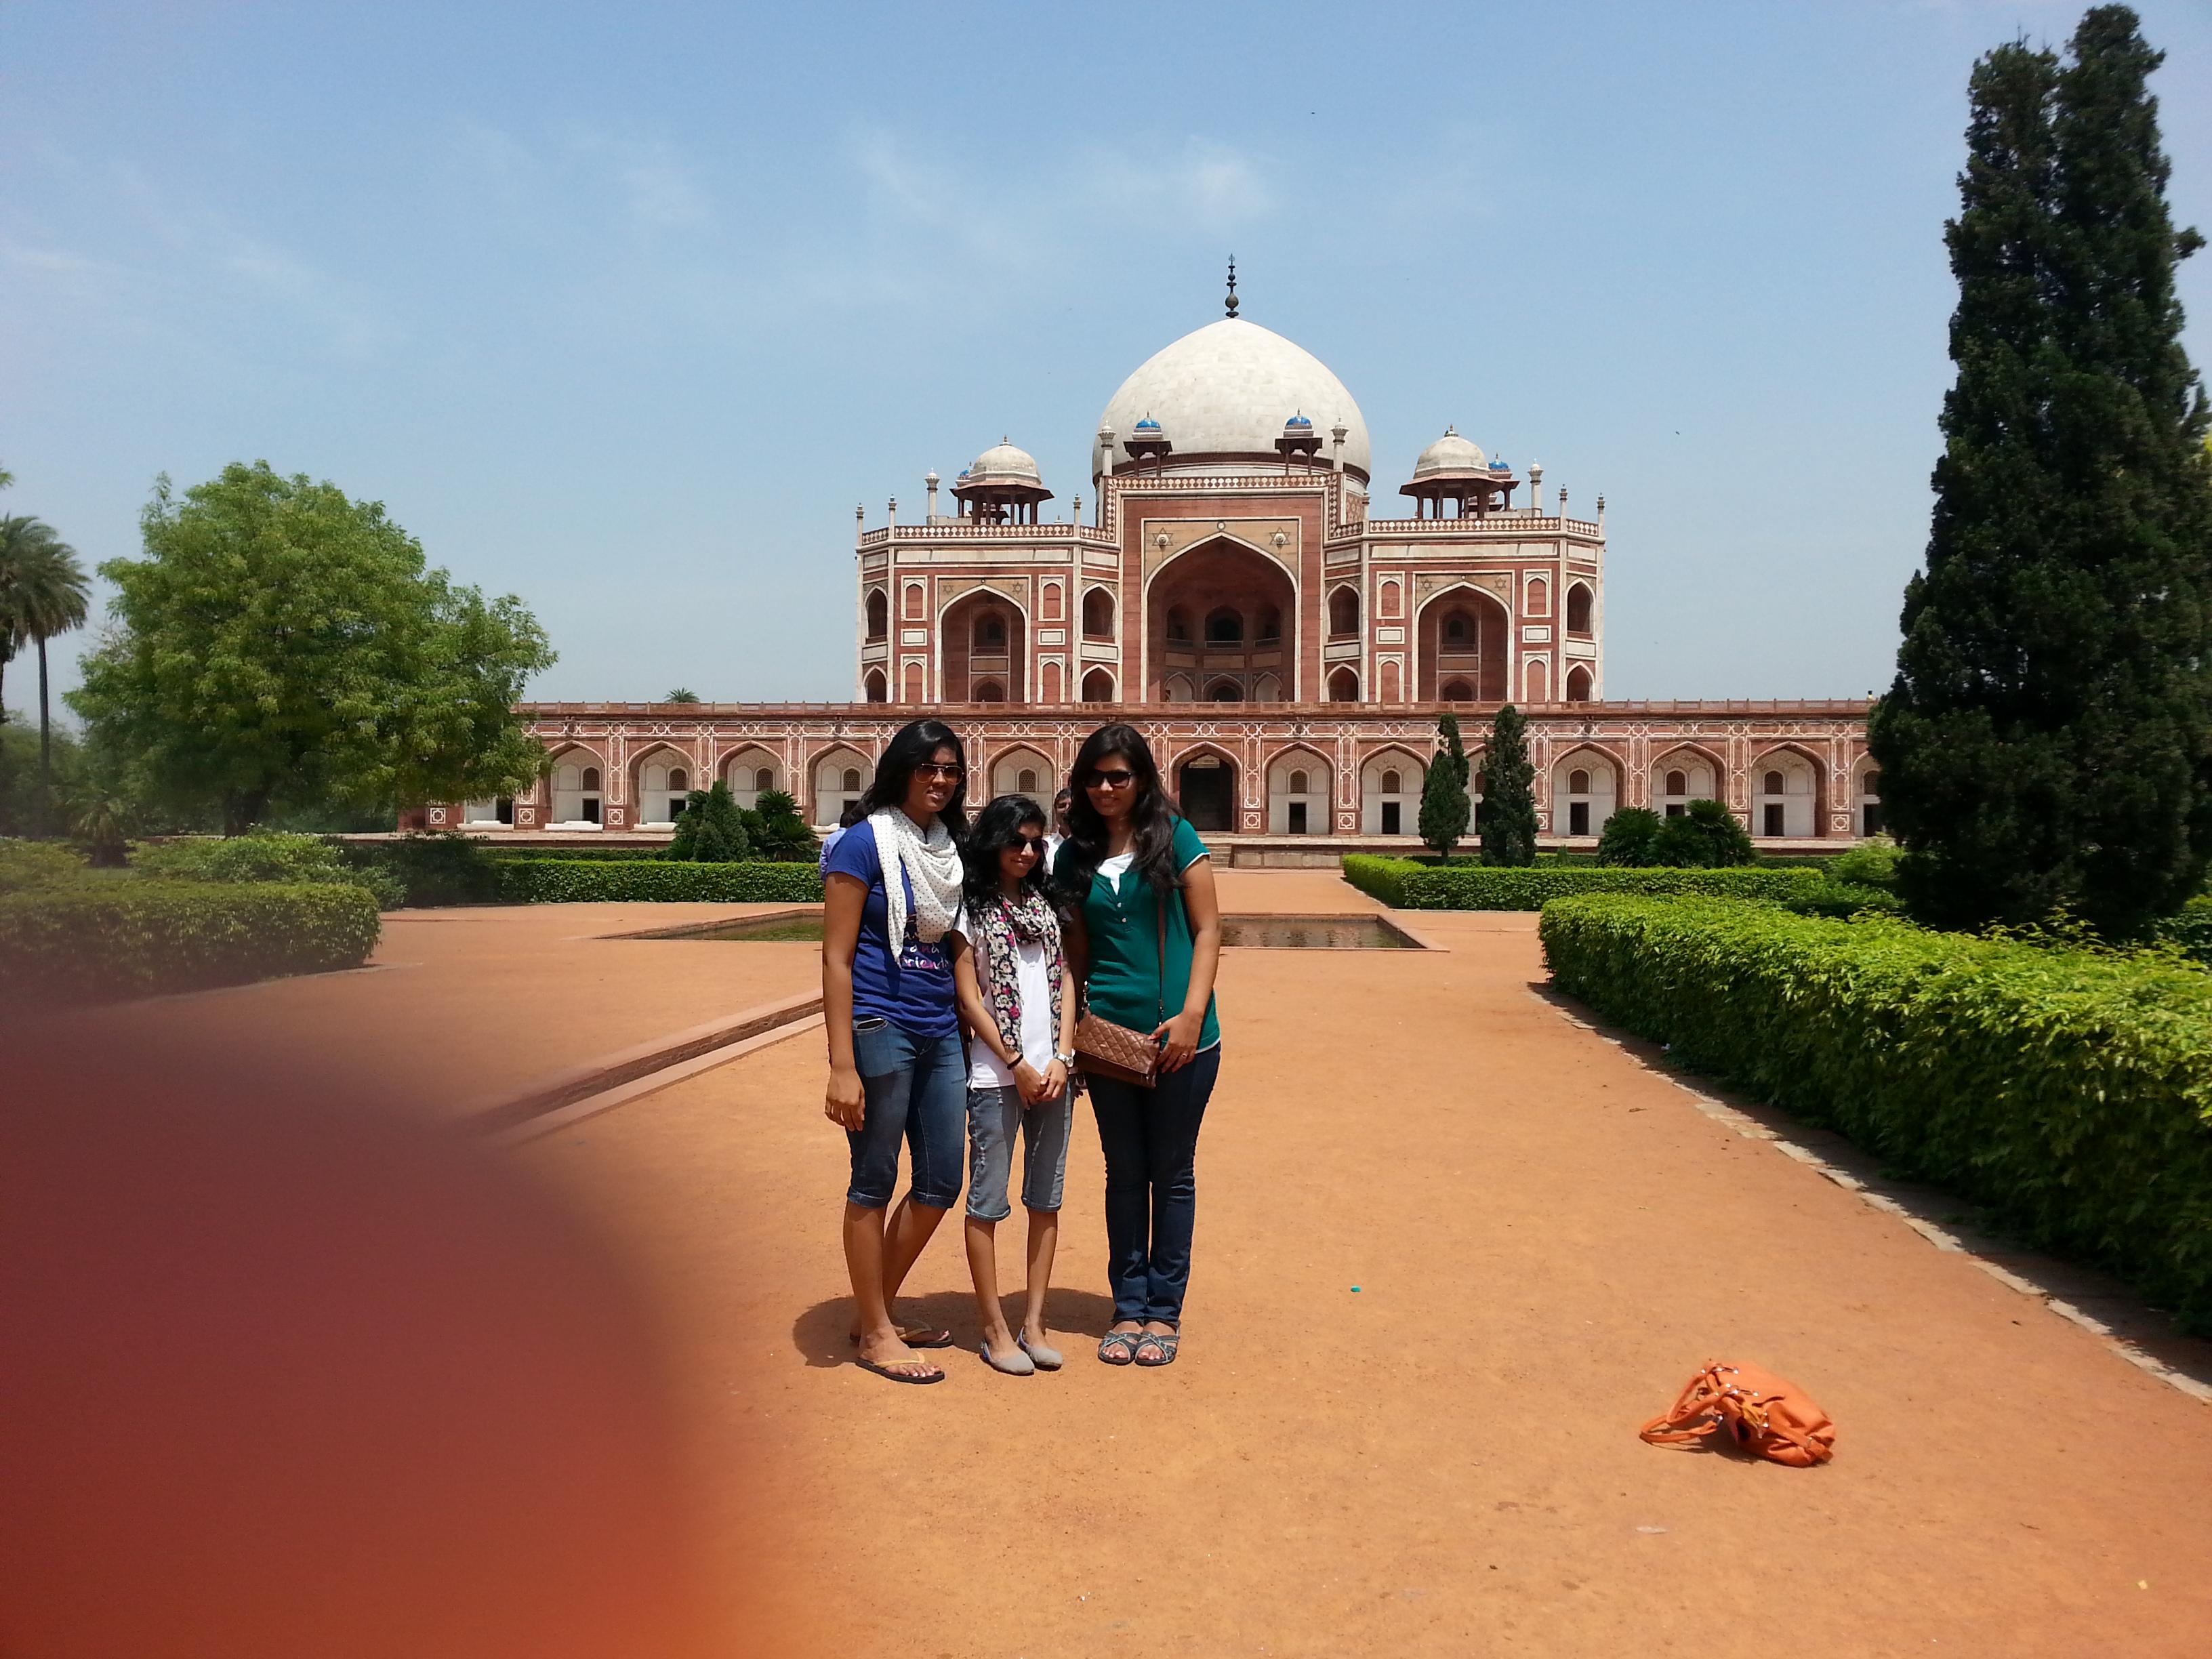 Humayuns tomb megha malpani